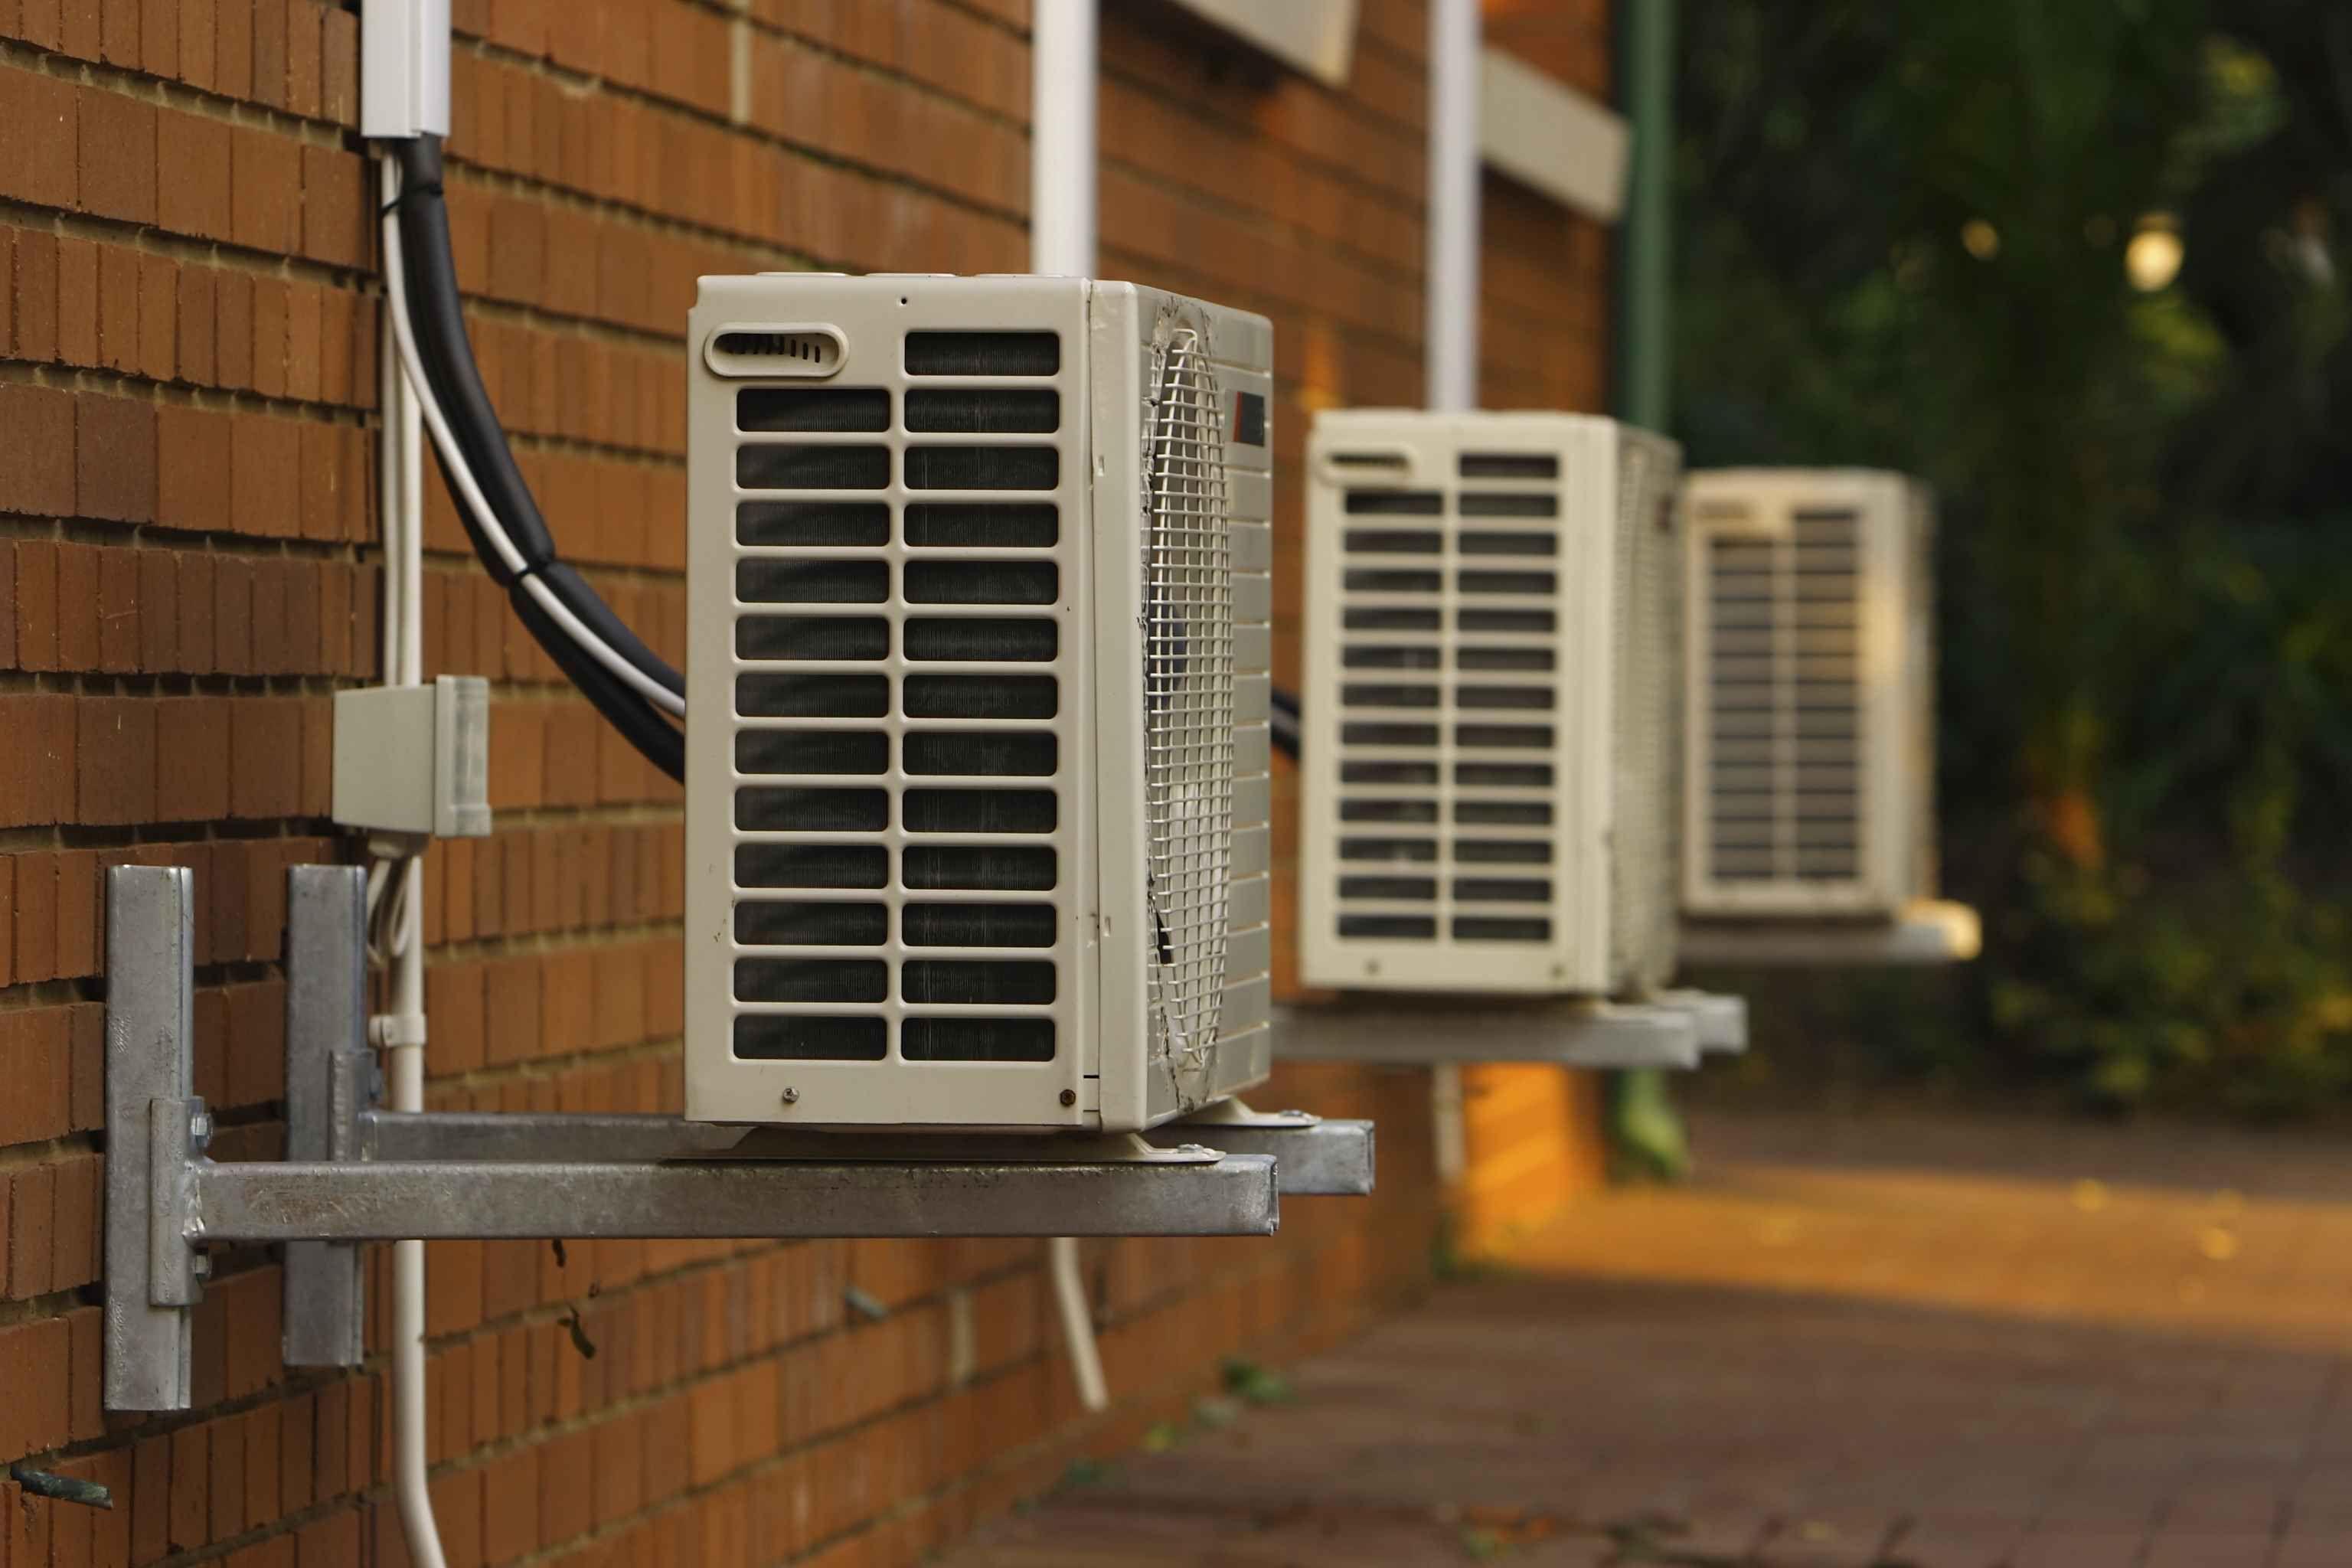 lifestyle greenliving energyconservation Inverter air